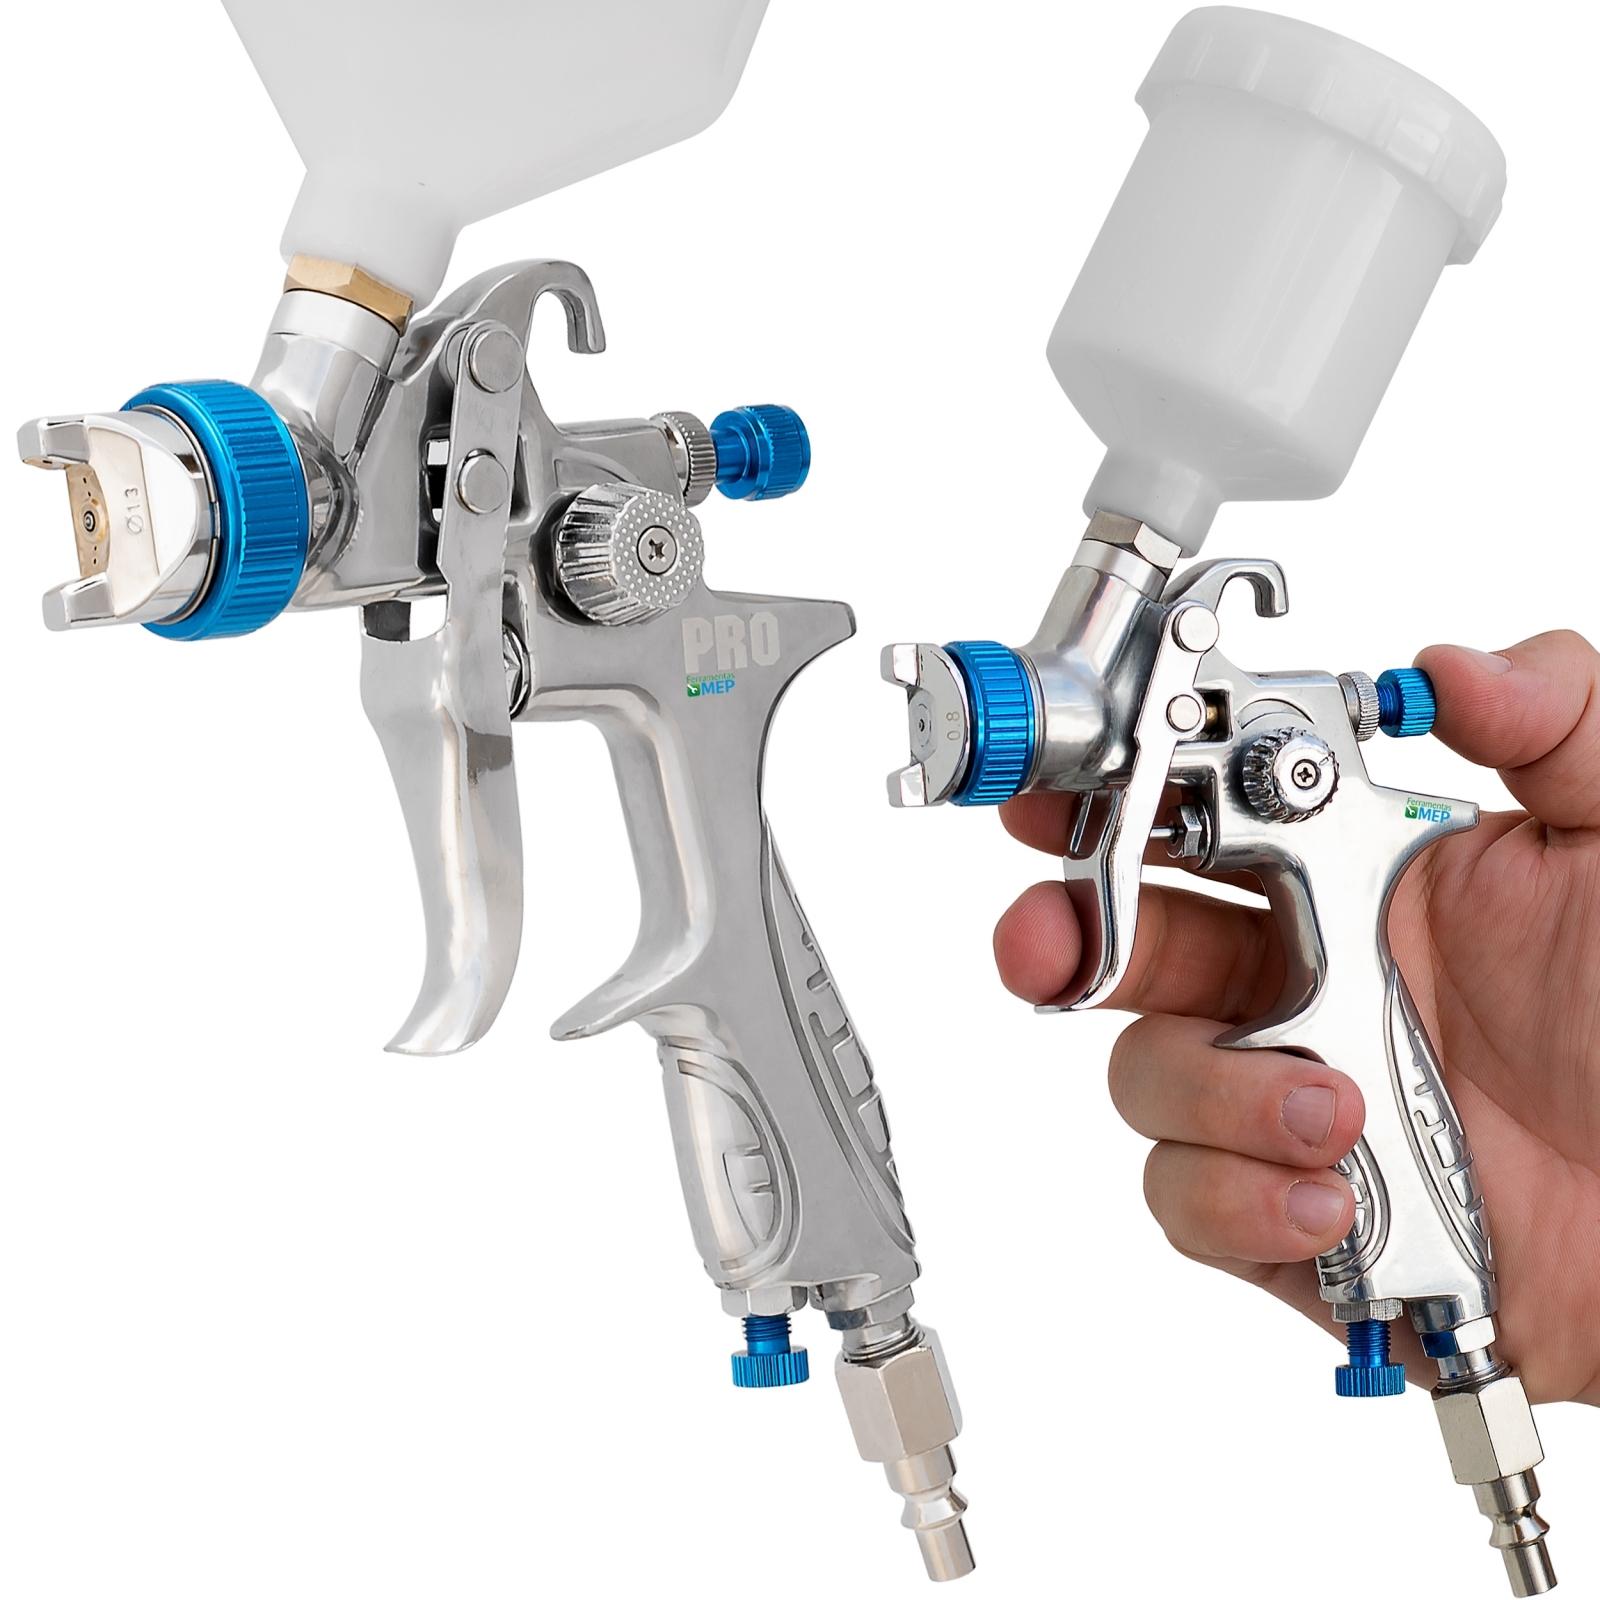 Kit Pistola De Pintura Hvlp Profissional Ldr Pro-530 + Pistola De Pintura Mini Hvlp  Ldr Pro-535 Kp2 - Ferramentas MEP